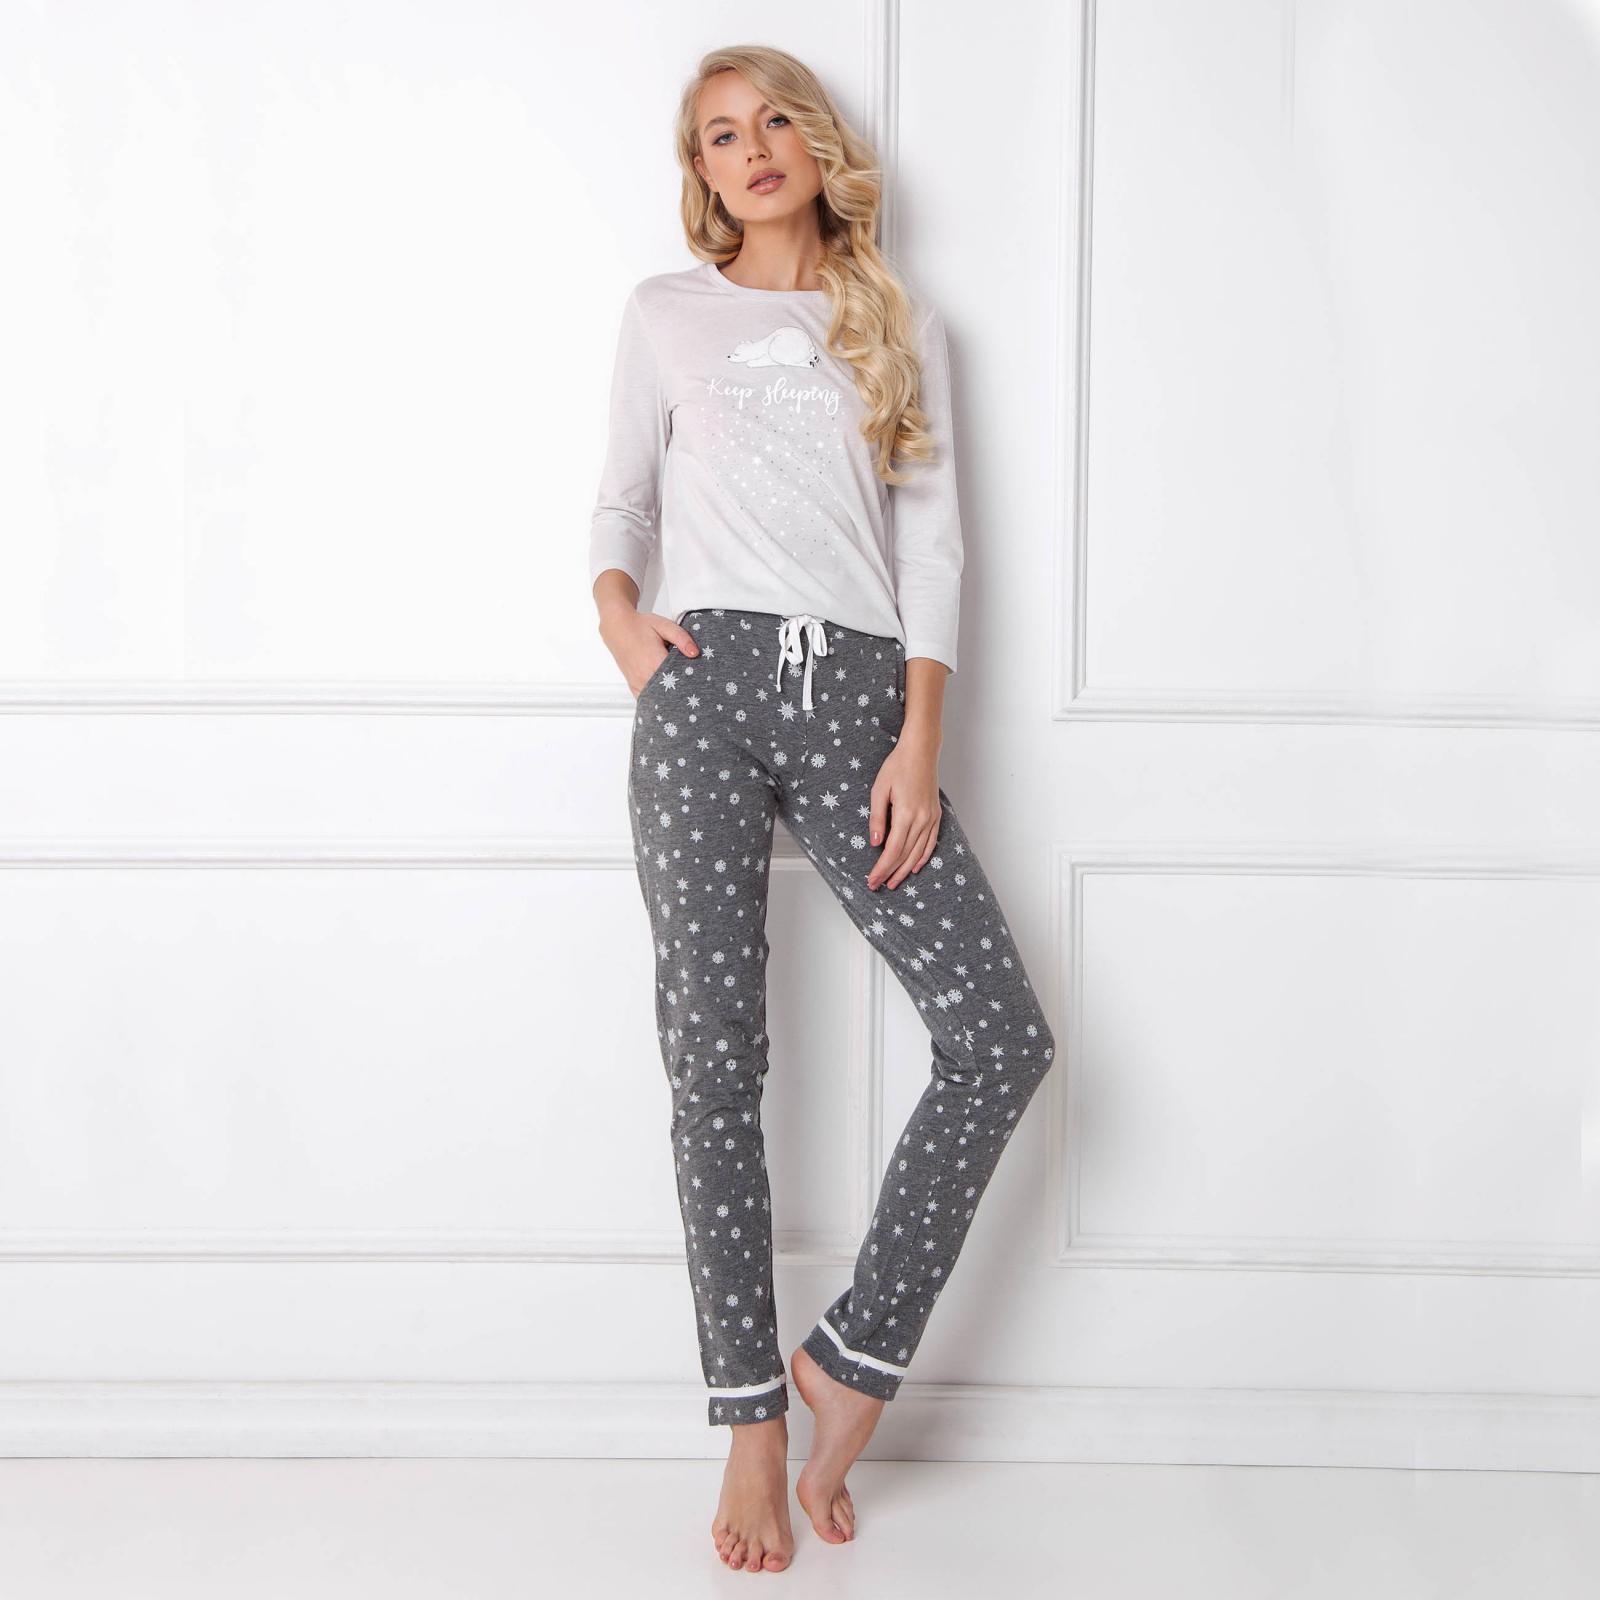 Pijamale dama Polar Bear 2 piese, pantaloni lungi